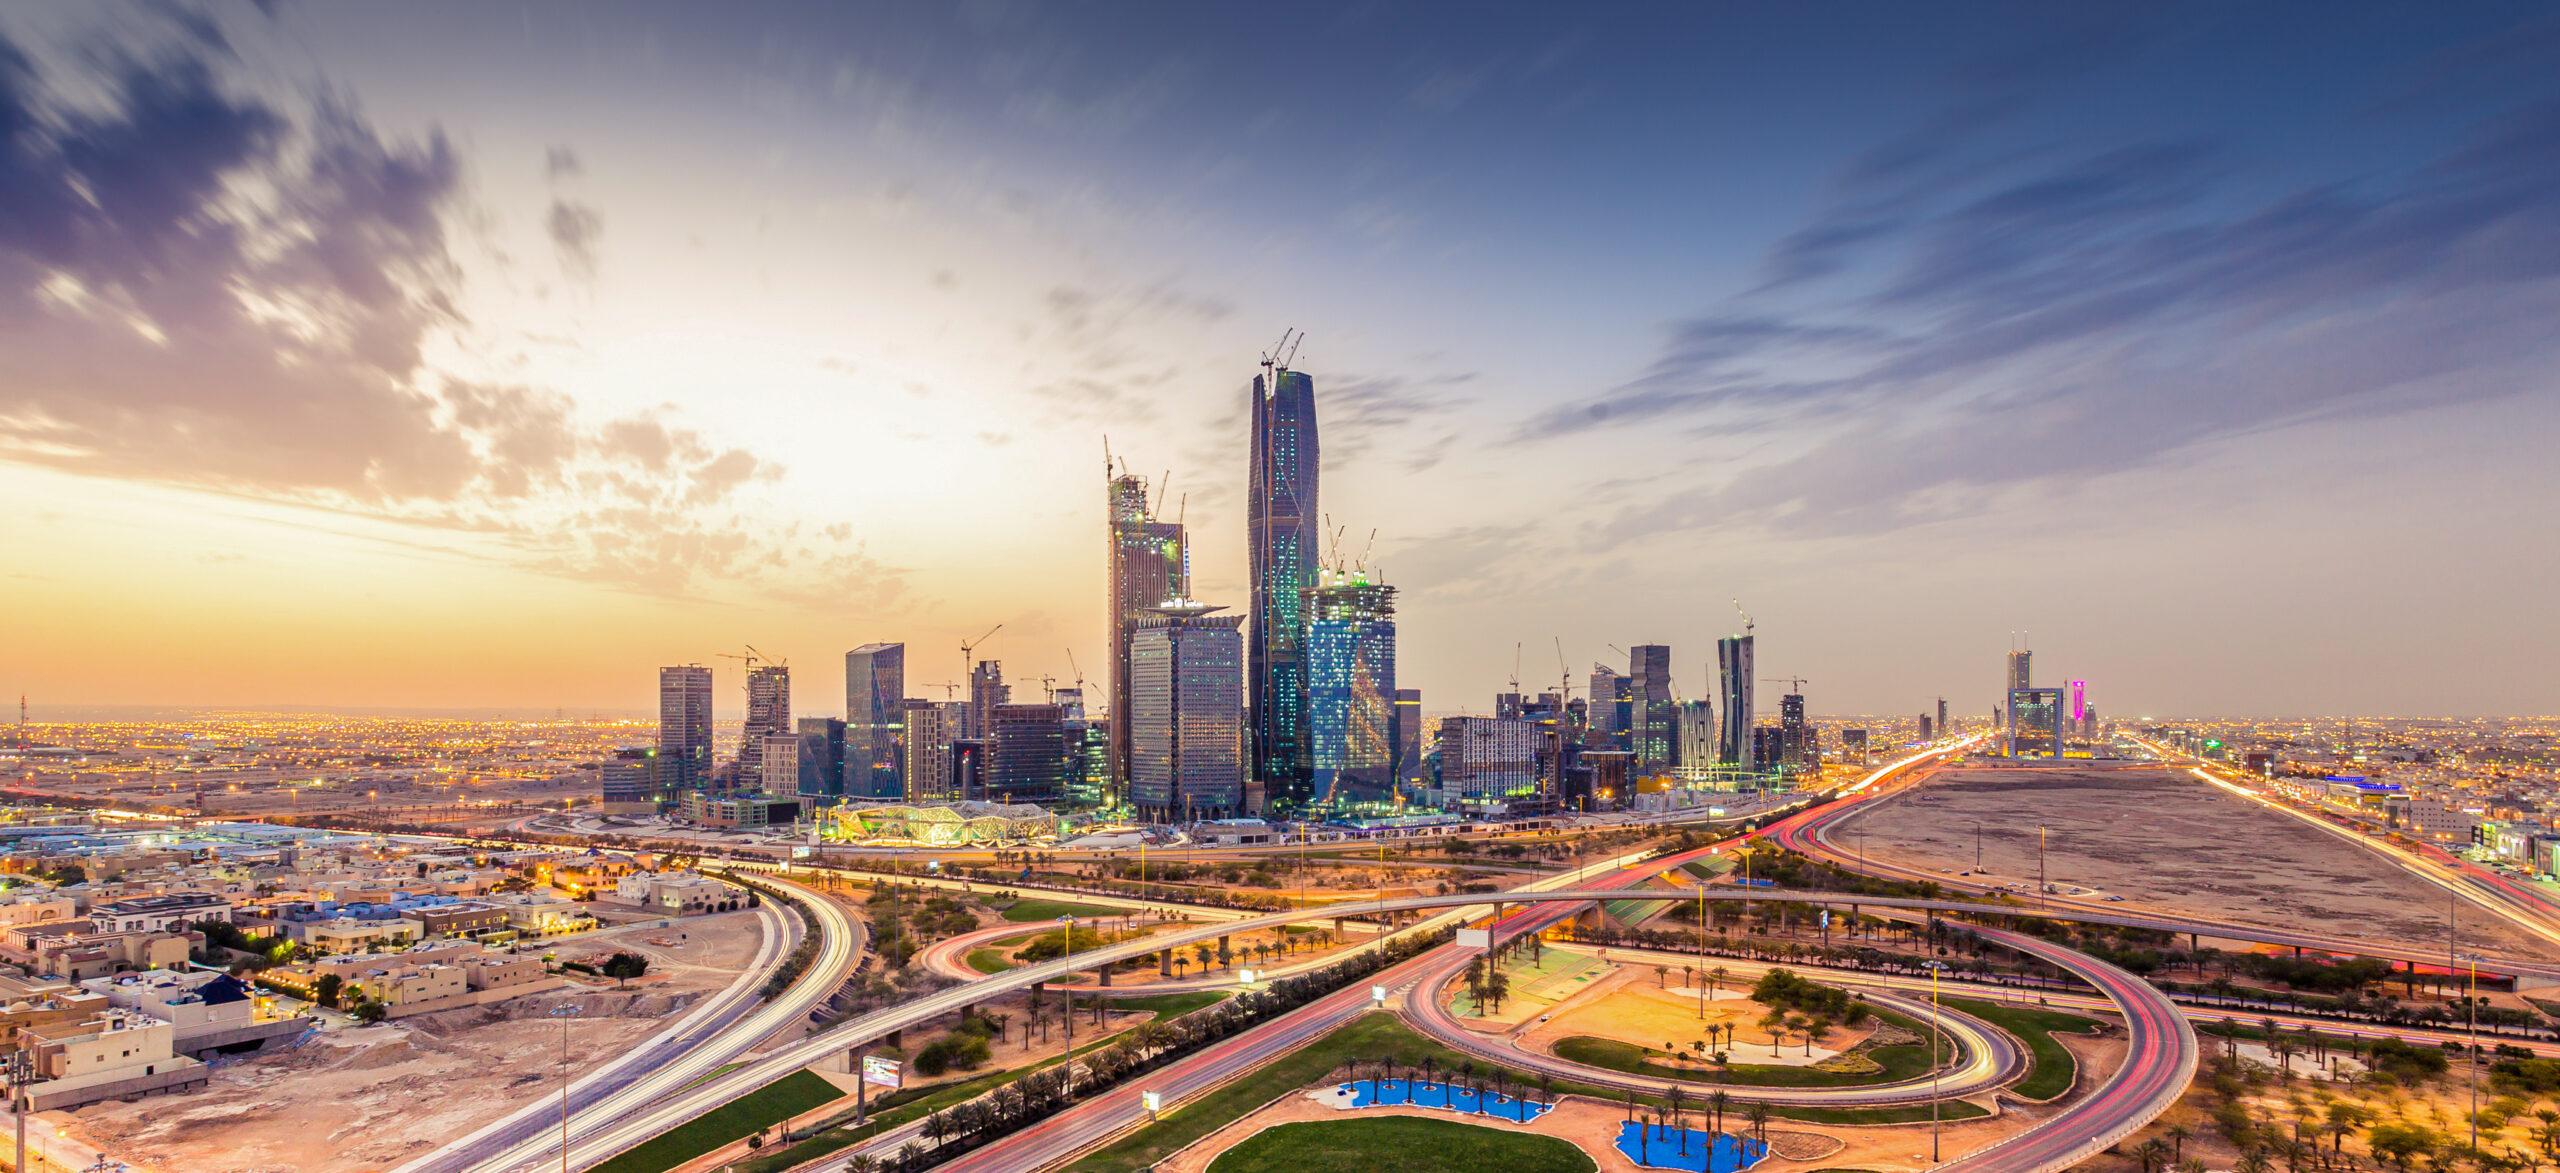 Riyadh city towers in Saudi Arabia. Photo by KhaledSaad001